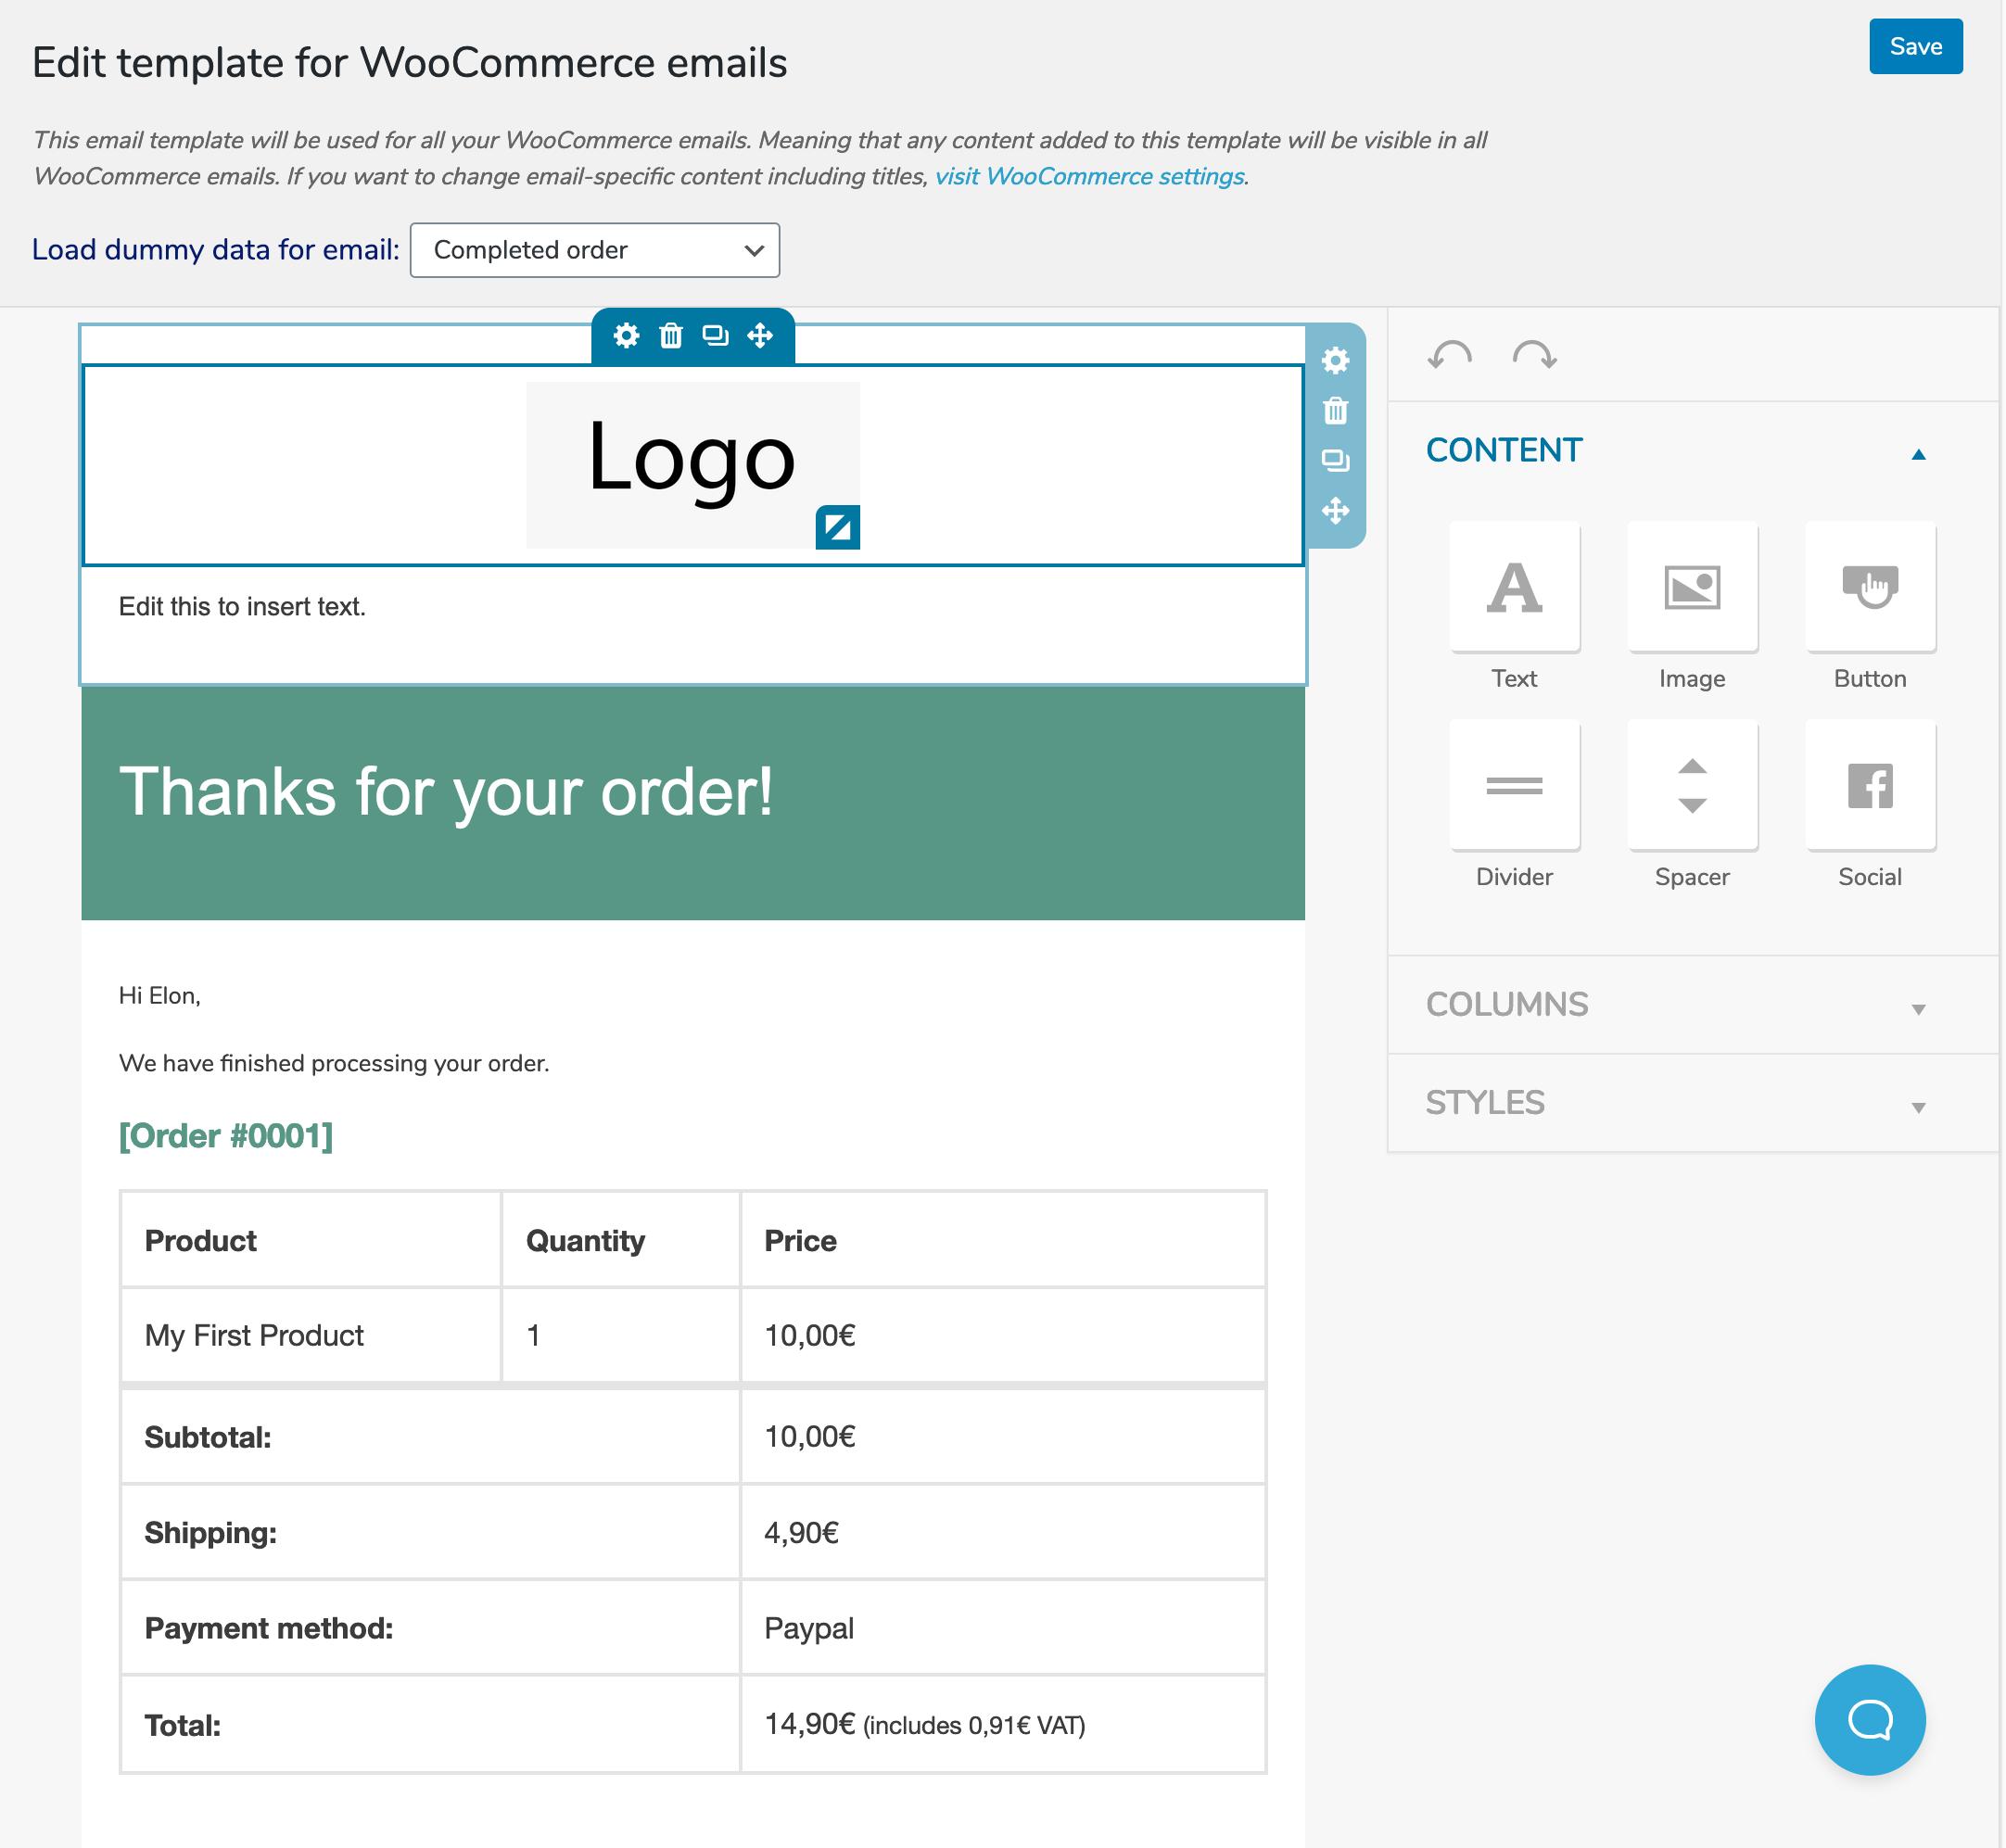 MailPoet Interface